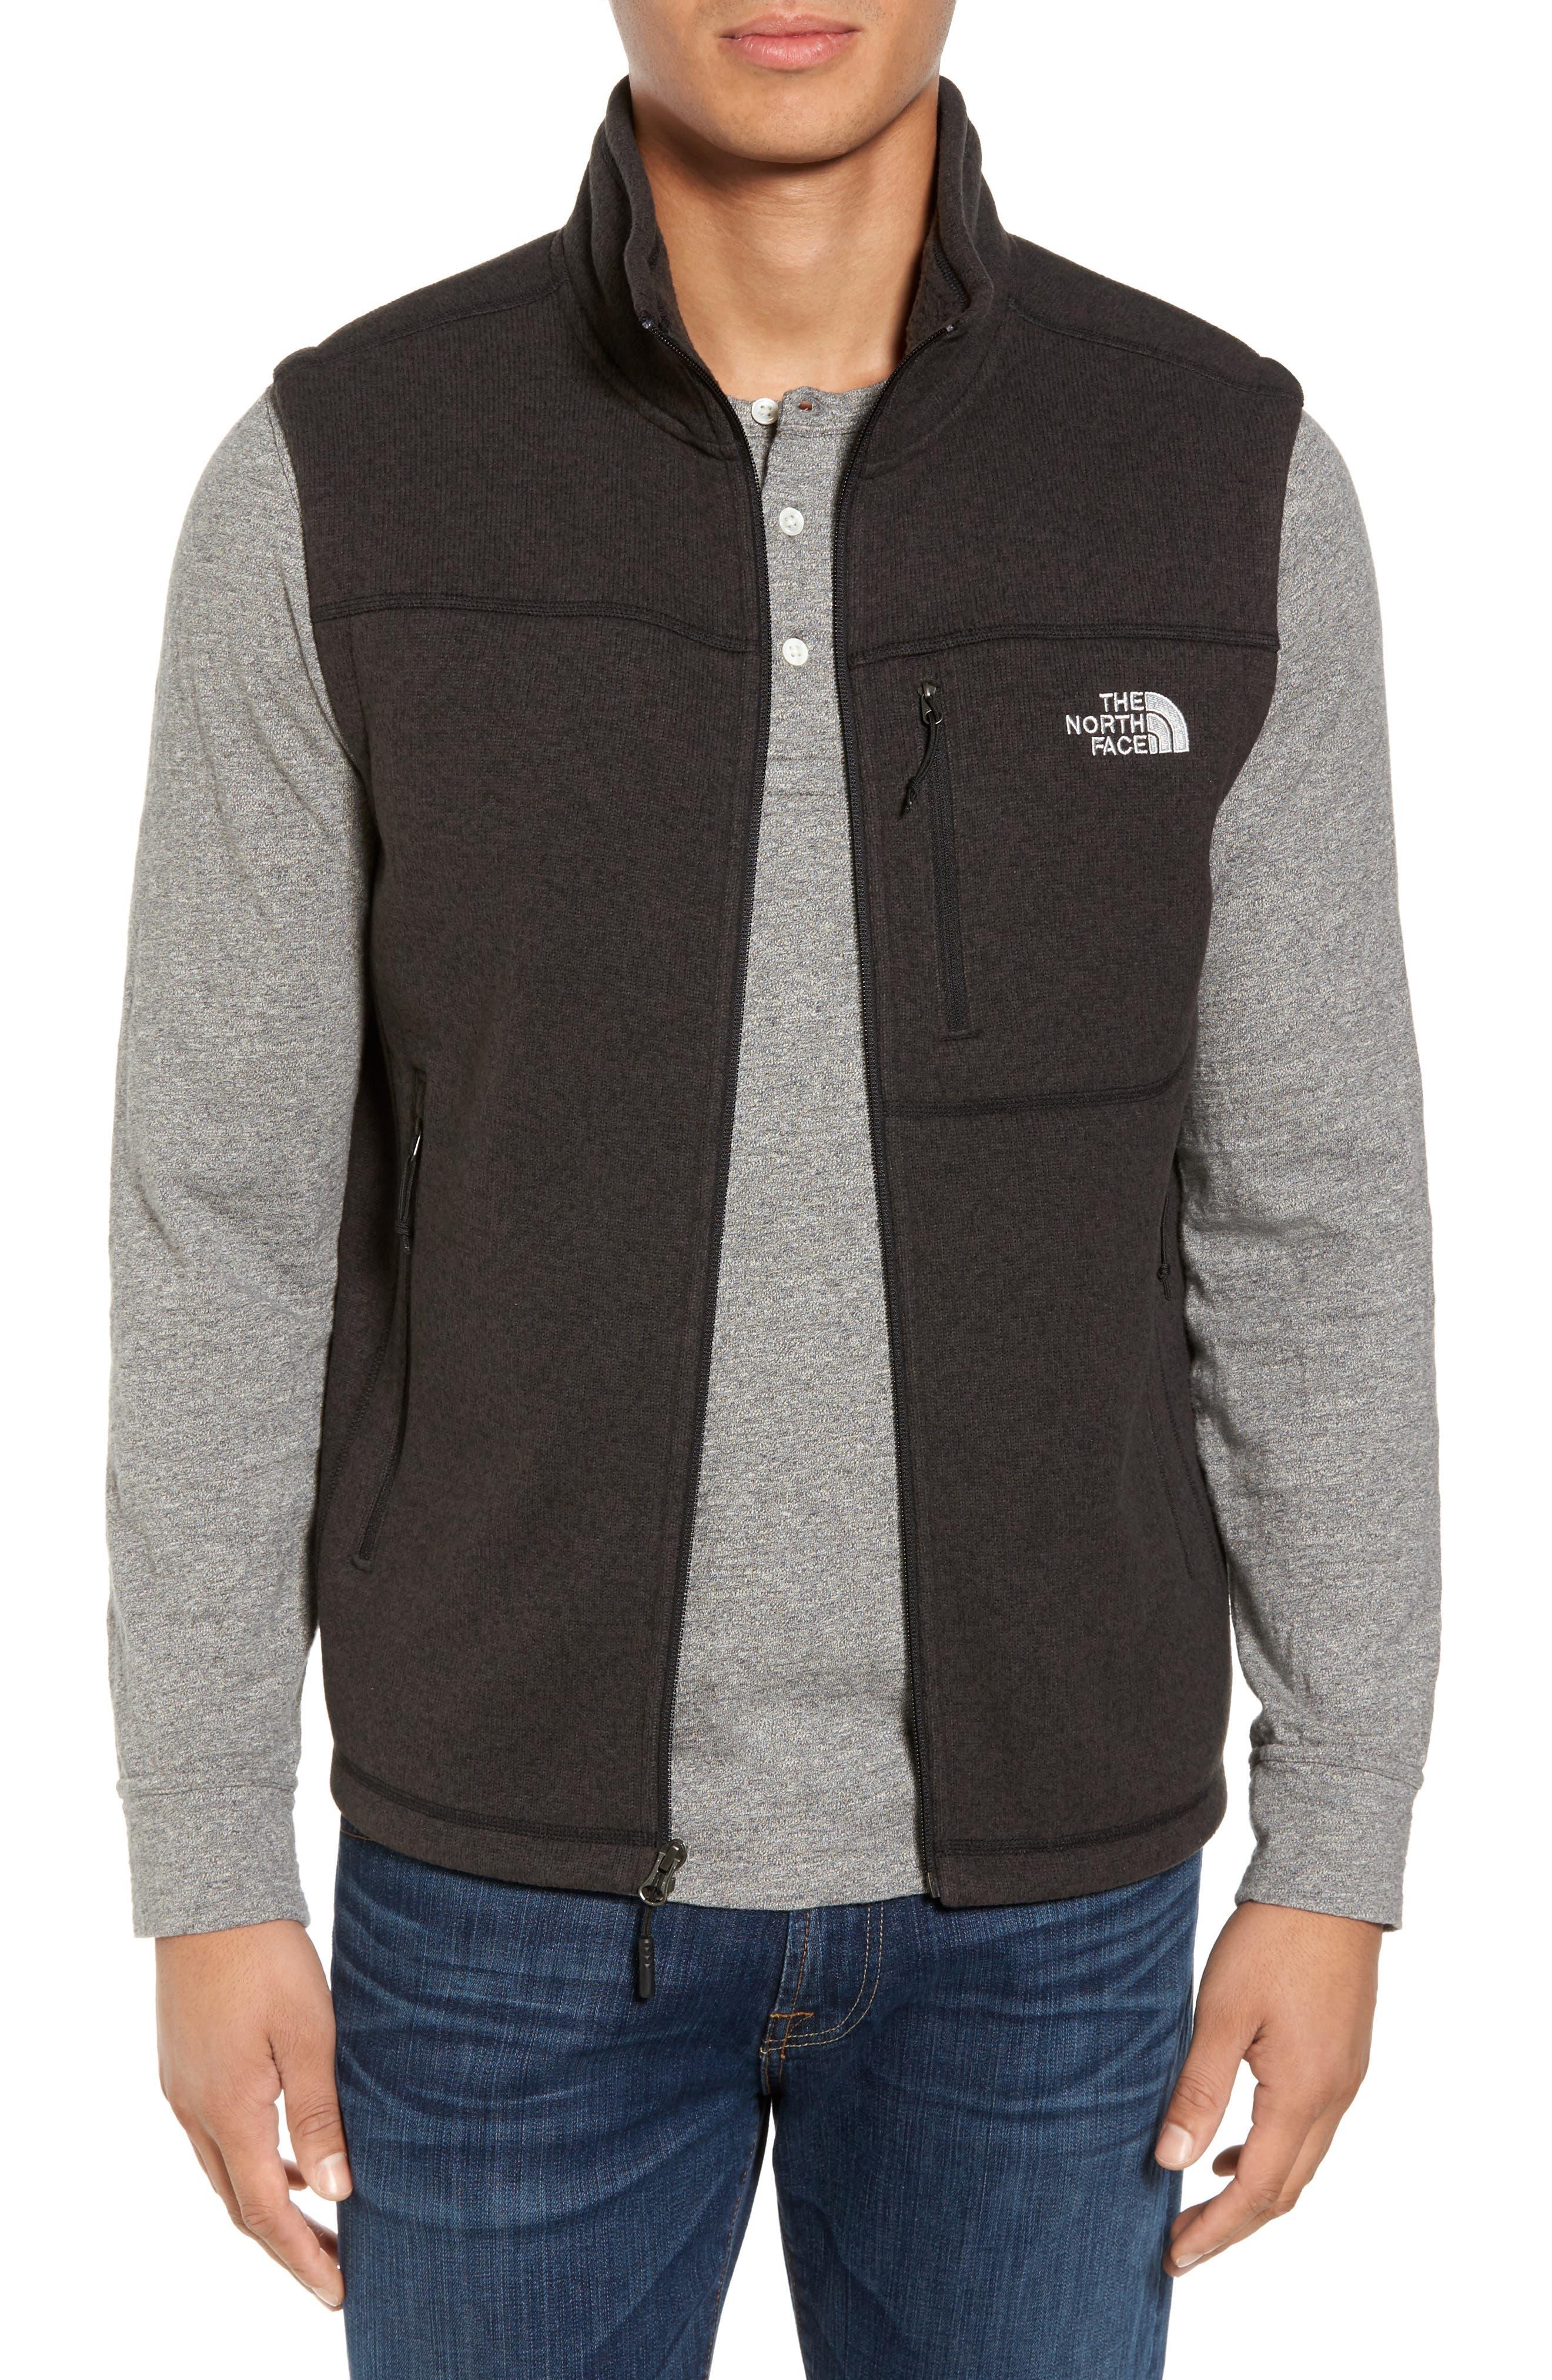 Gordon Lyons Zip Fleece Vest,                         Main,                         color,